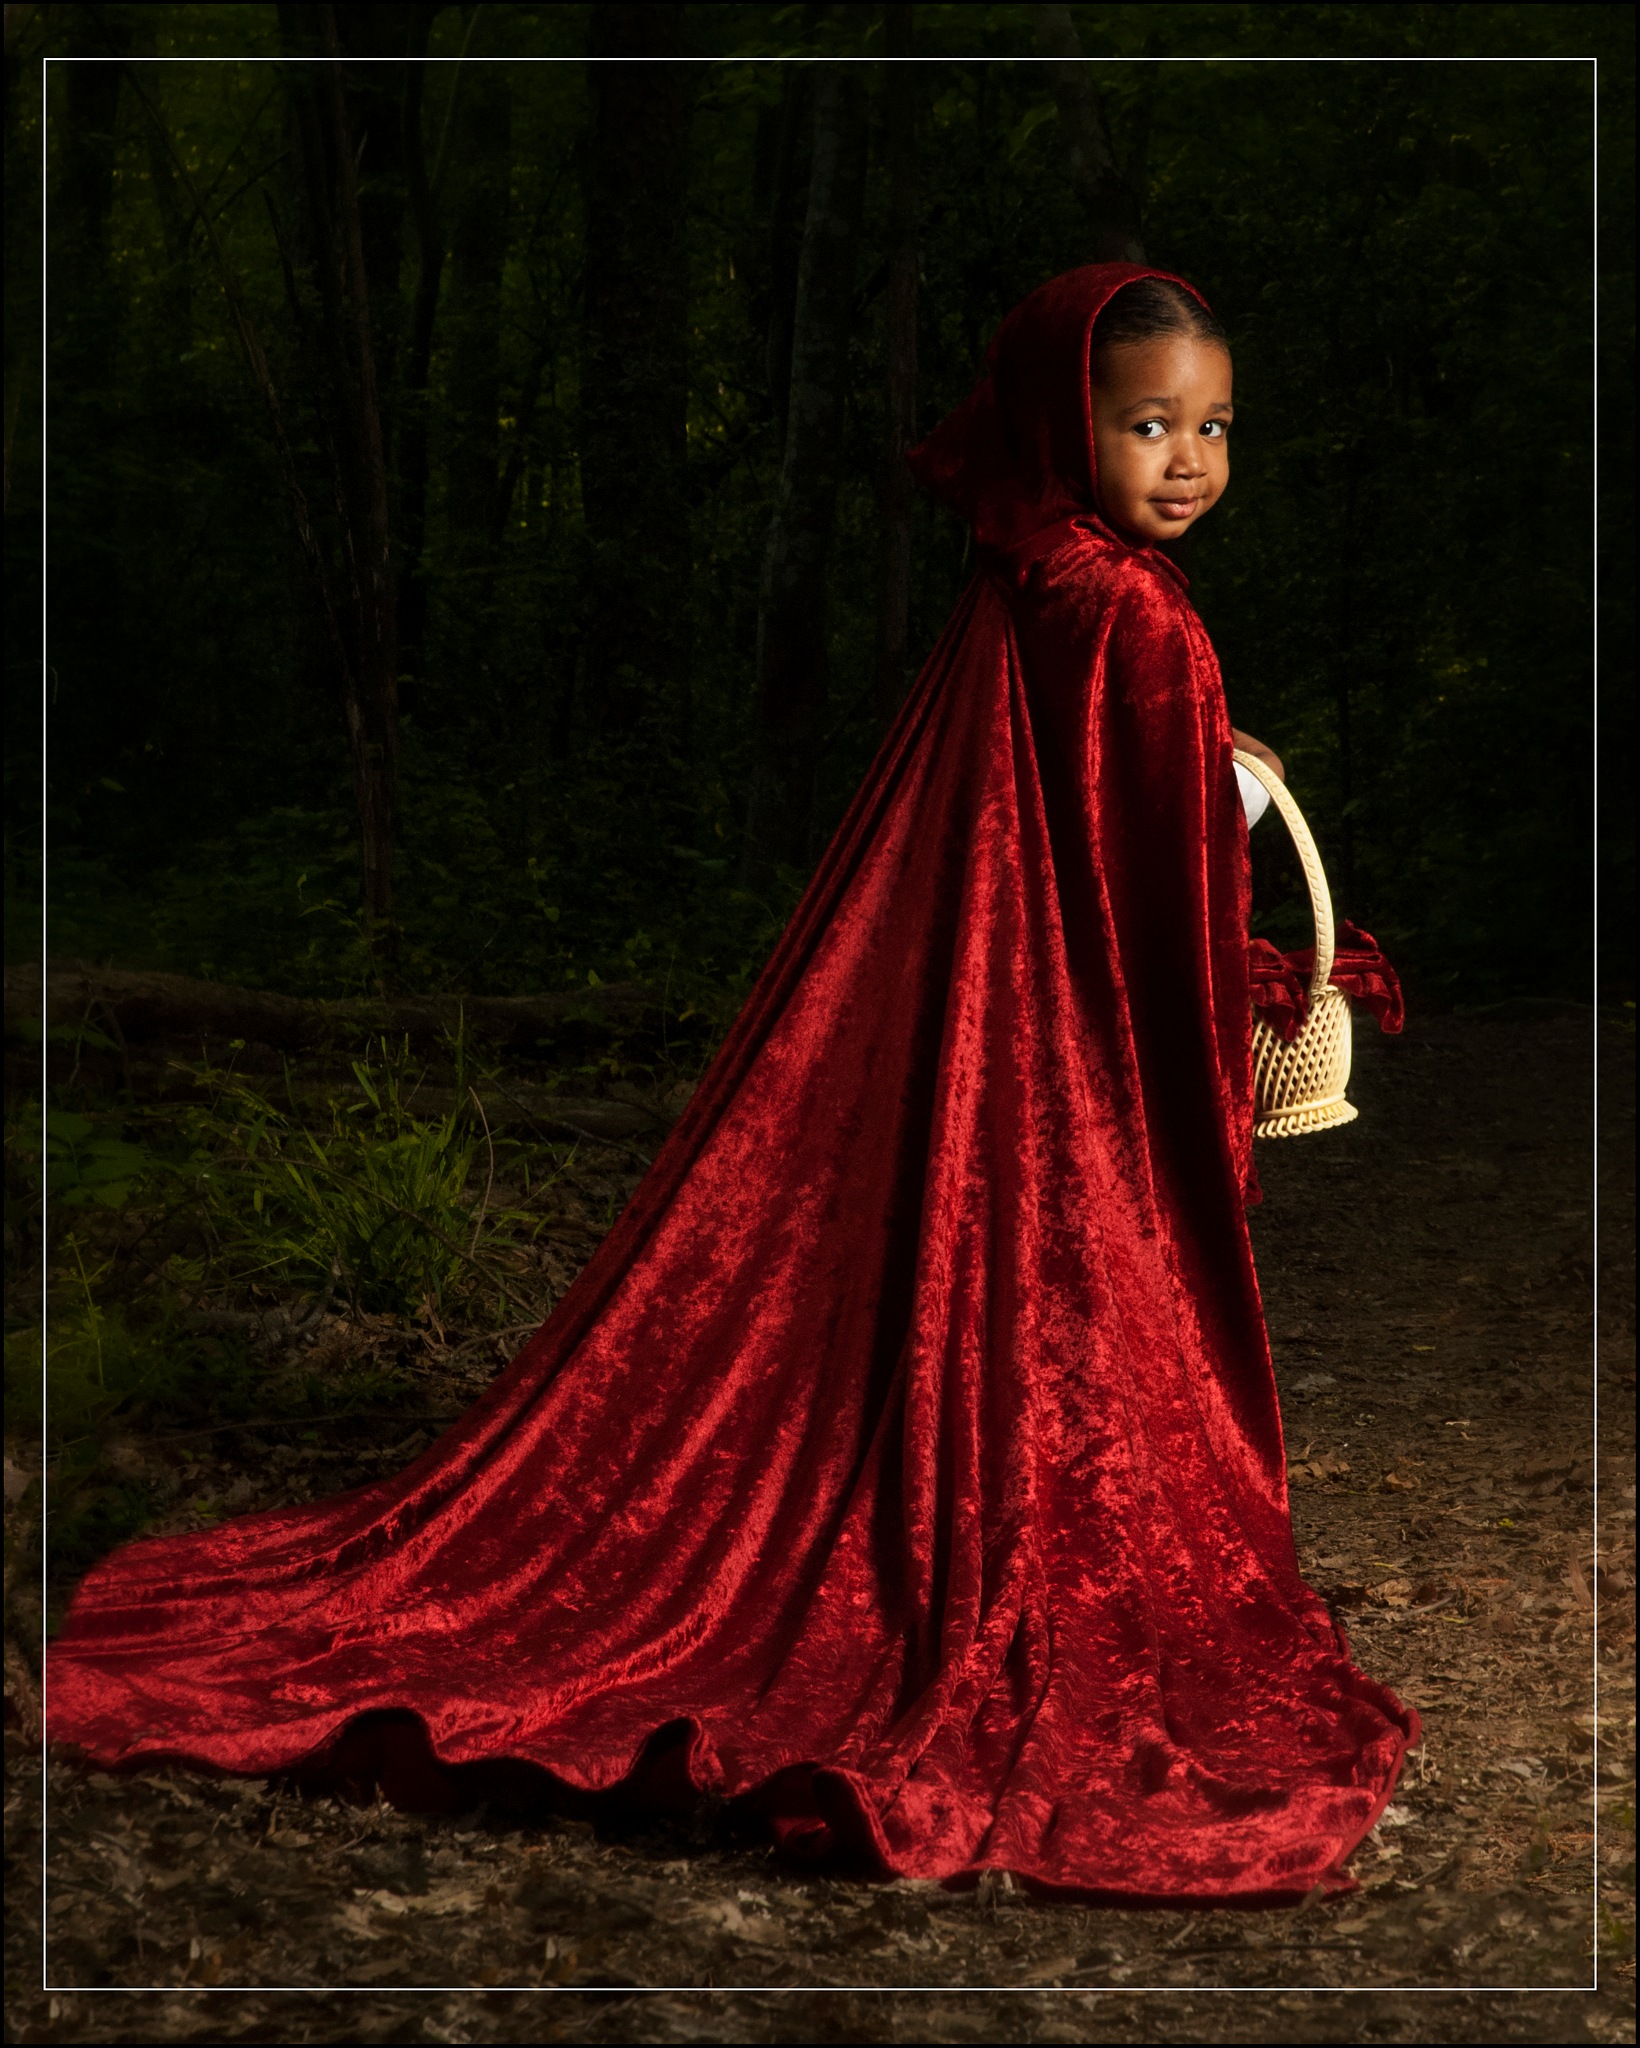 Little Red by  Bernitki Stradford